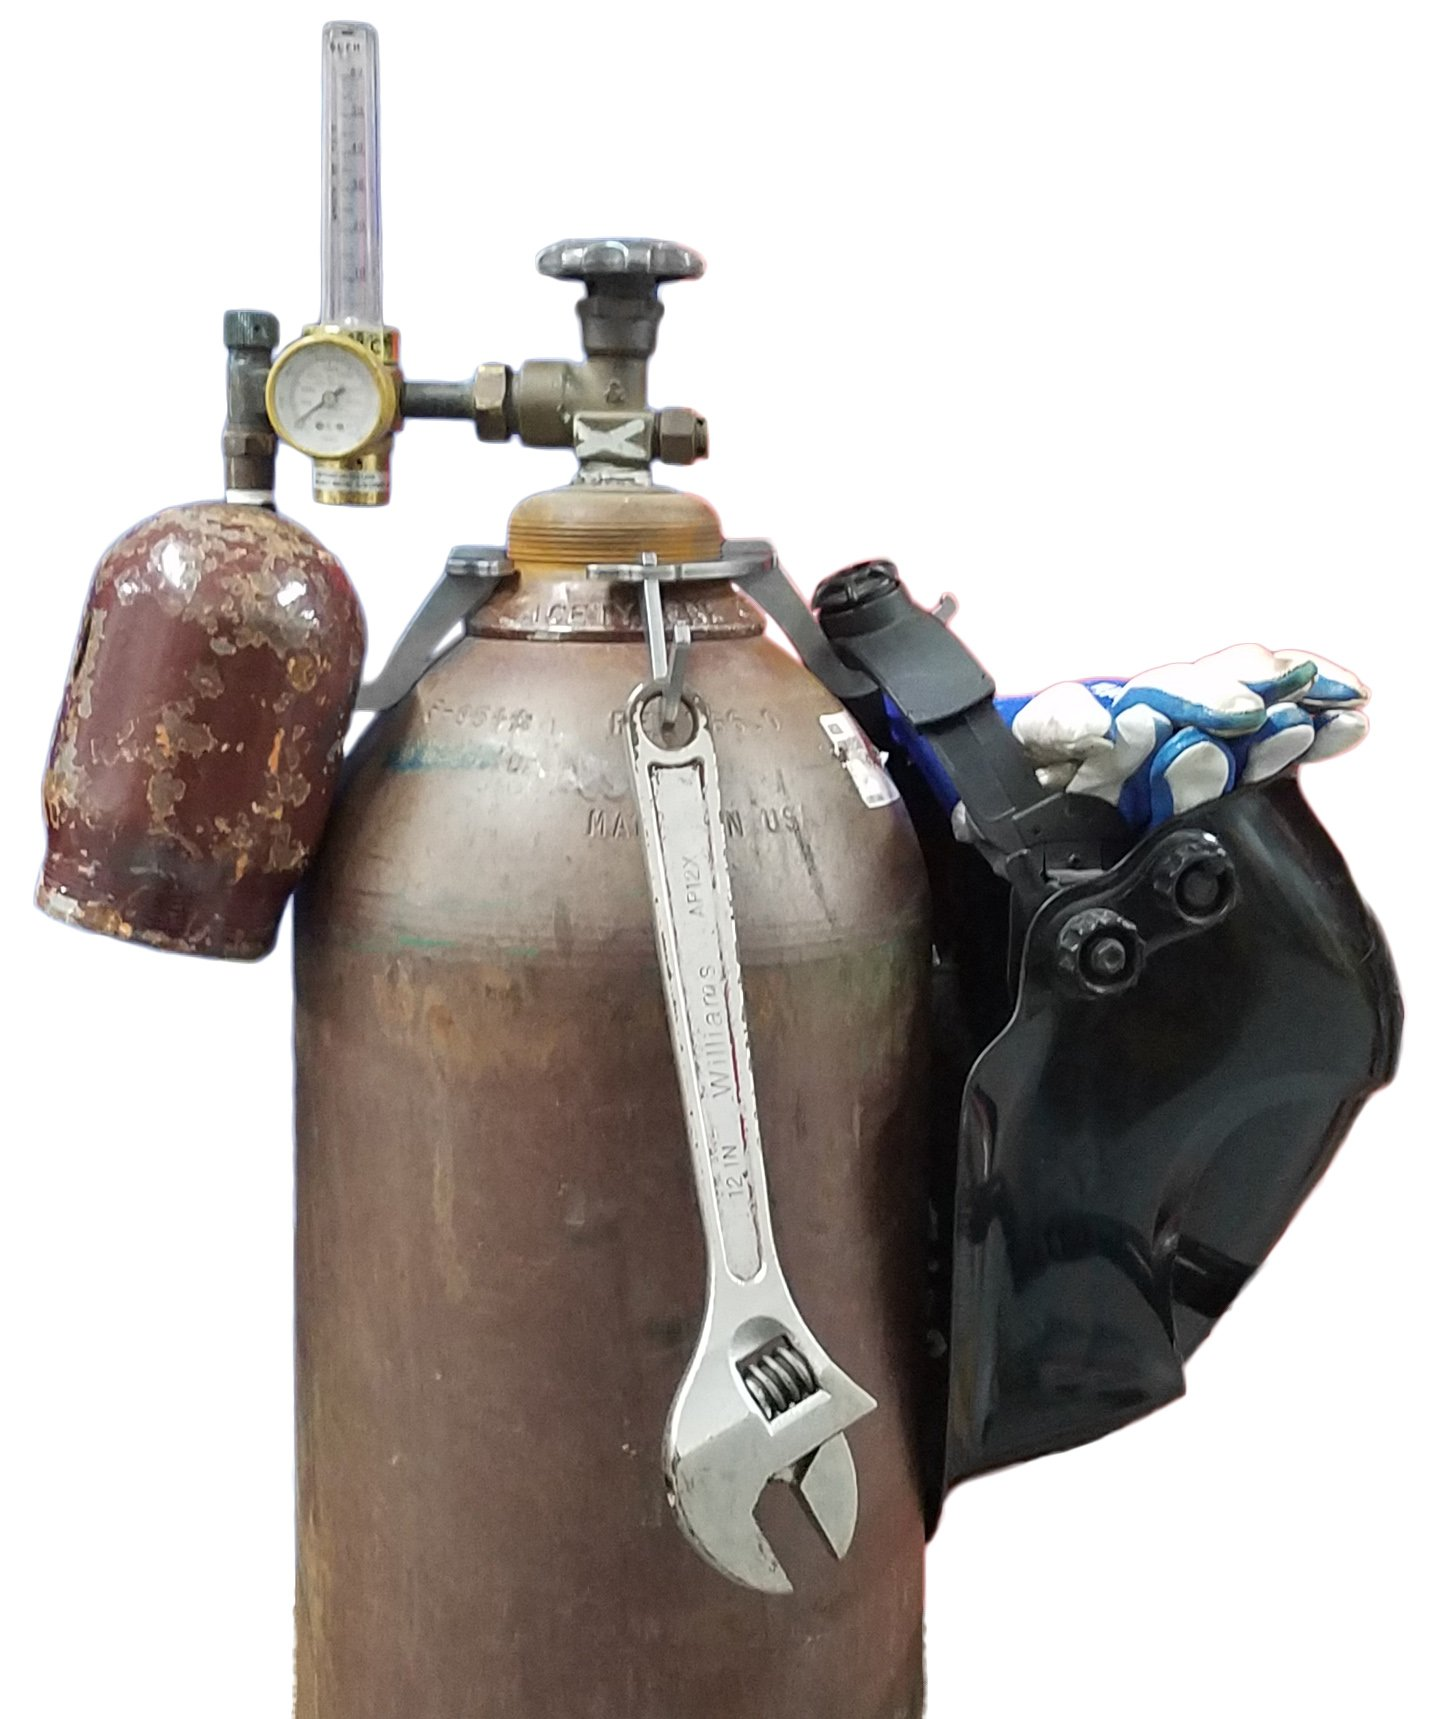 Hel-Hook Steel Welding Hanger Kit - Standard by Mercury Plastics